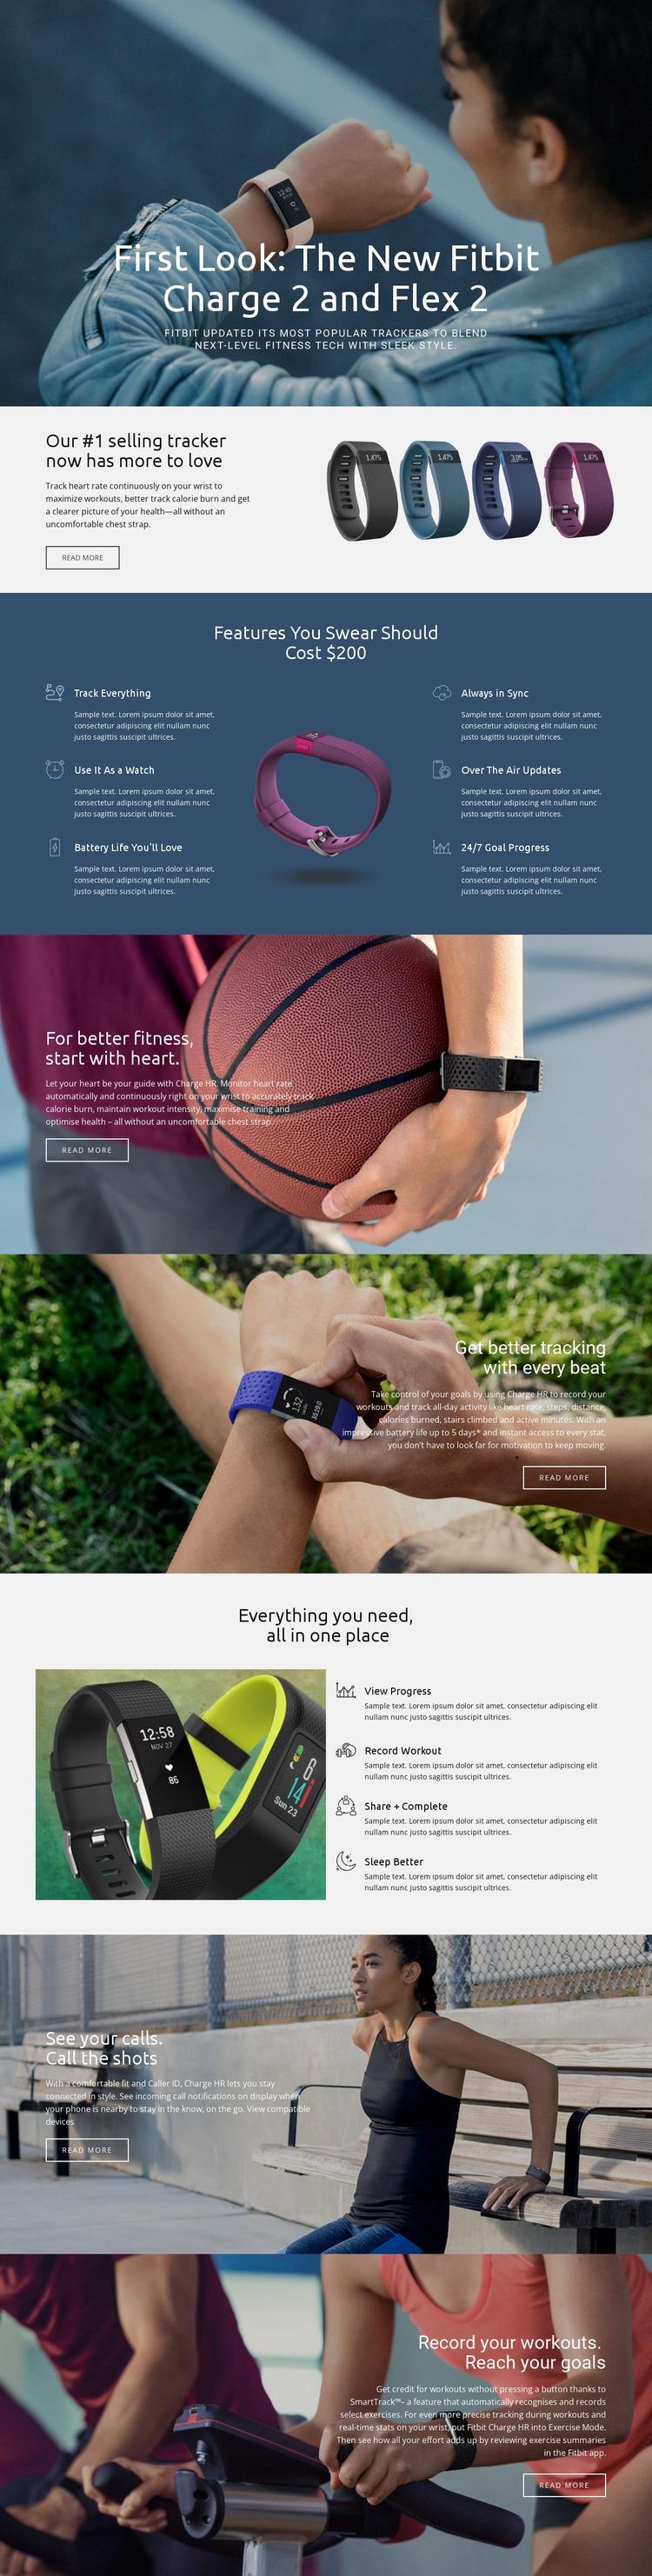 Flex 2 Website Mockup